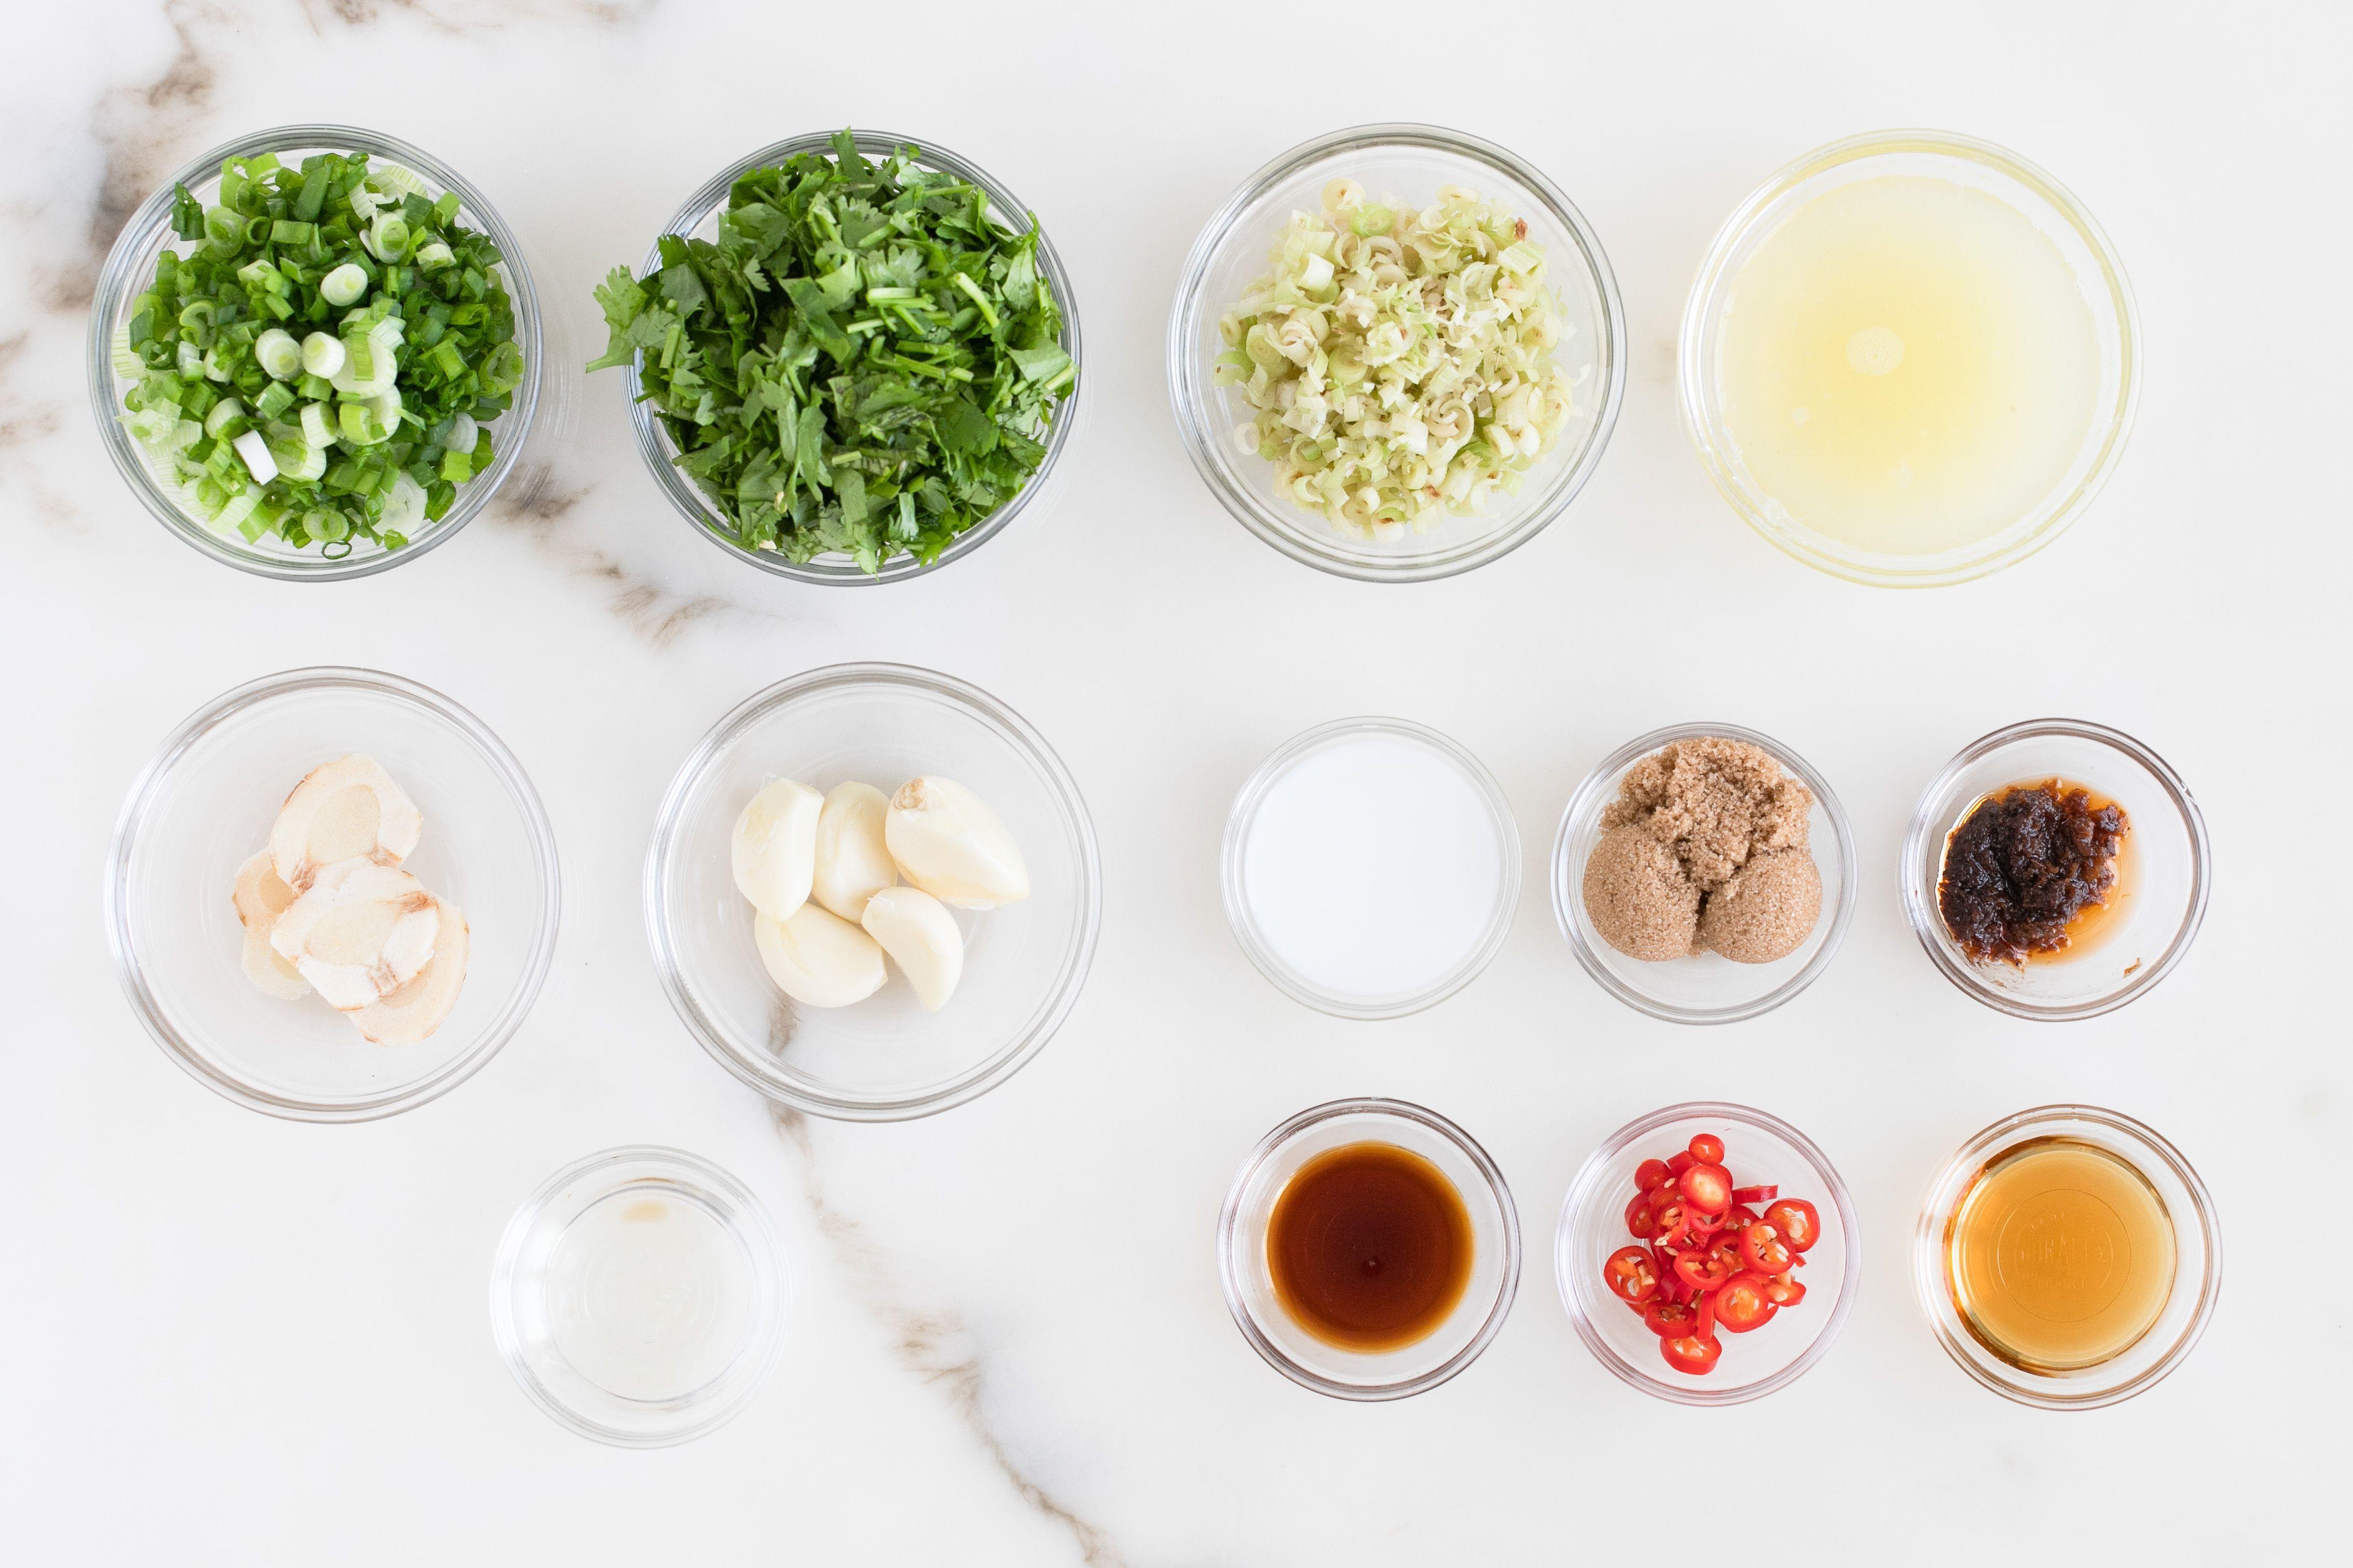 Ingredients for tom yum paste